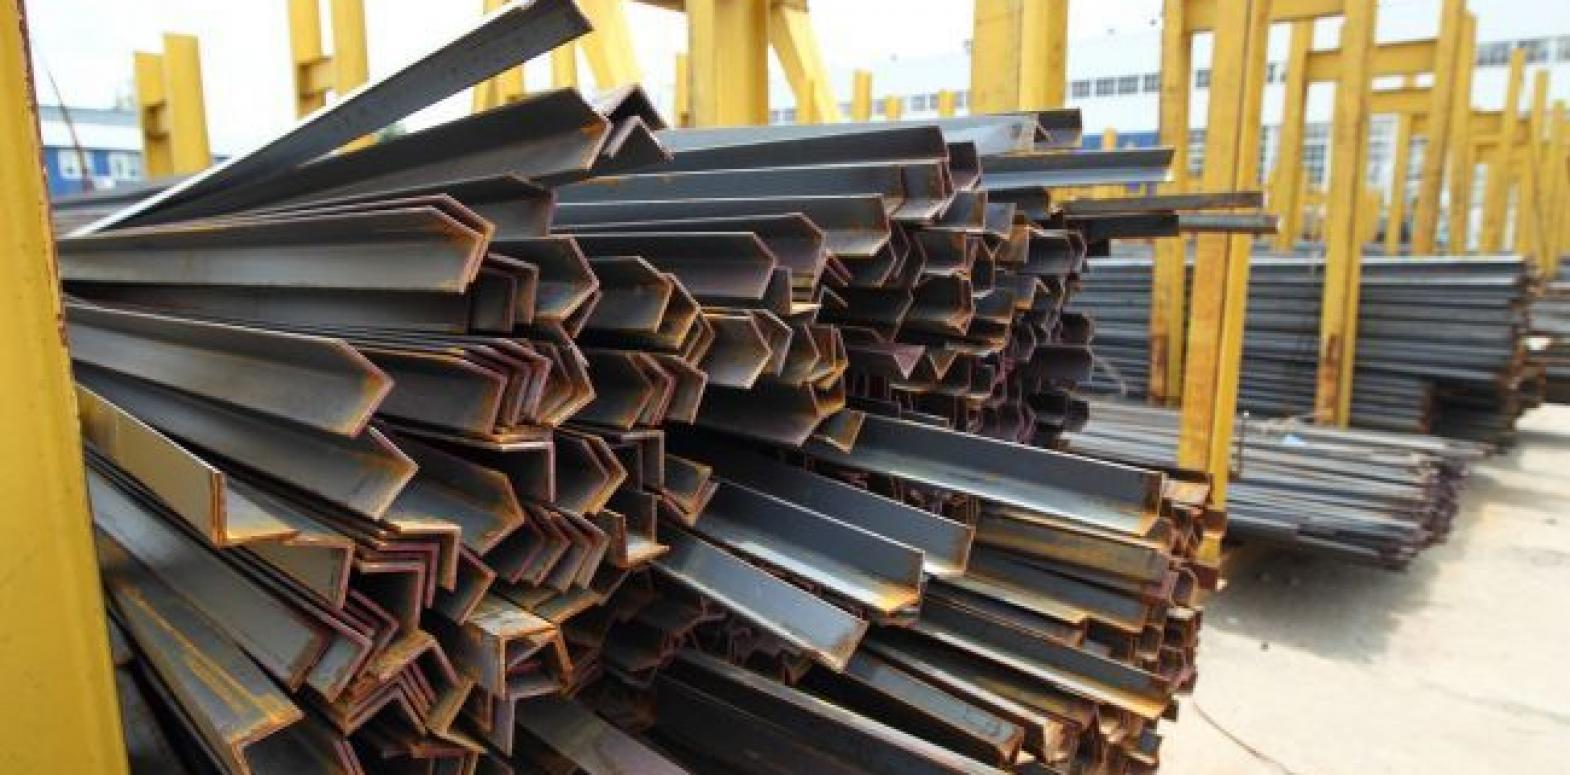 Производители промпродукции снижают цены третий месяц подряд